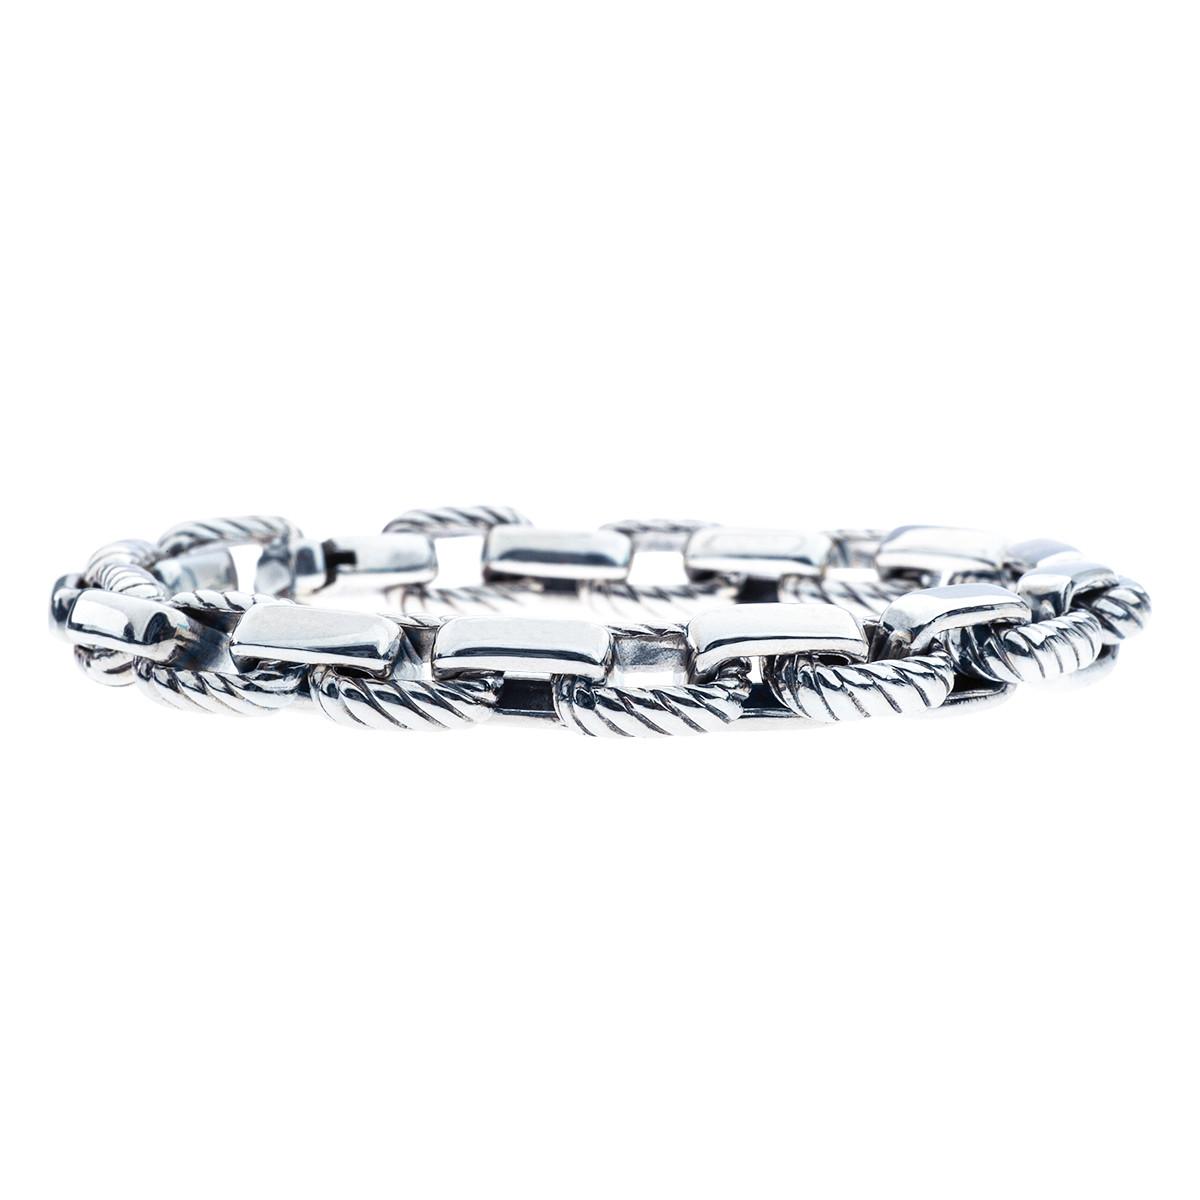 Vintage David Yurman Empire Link Bracelet